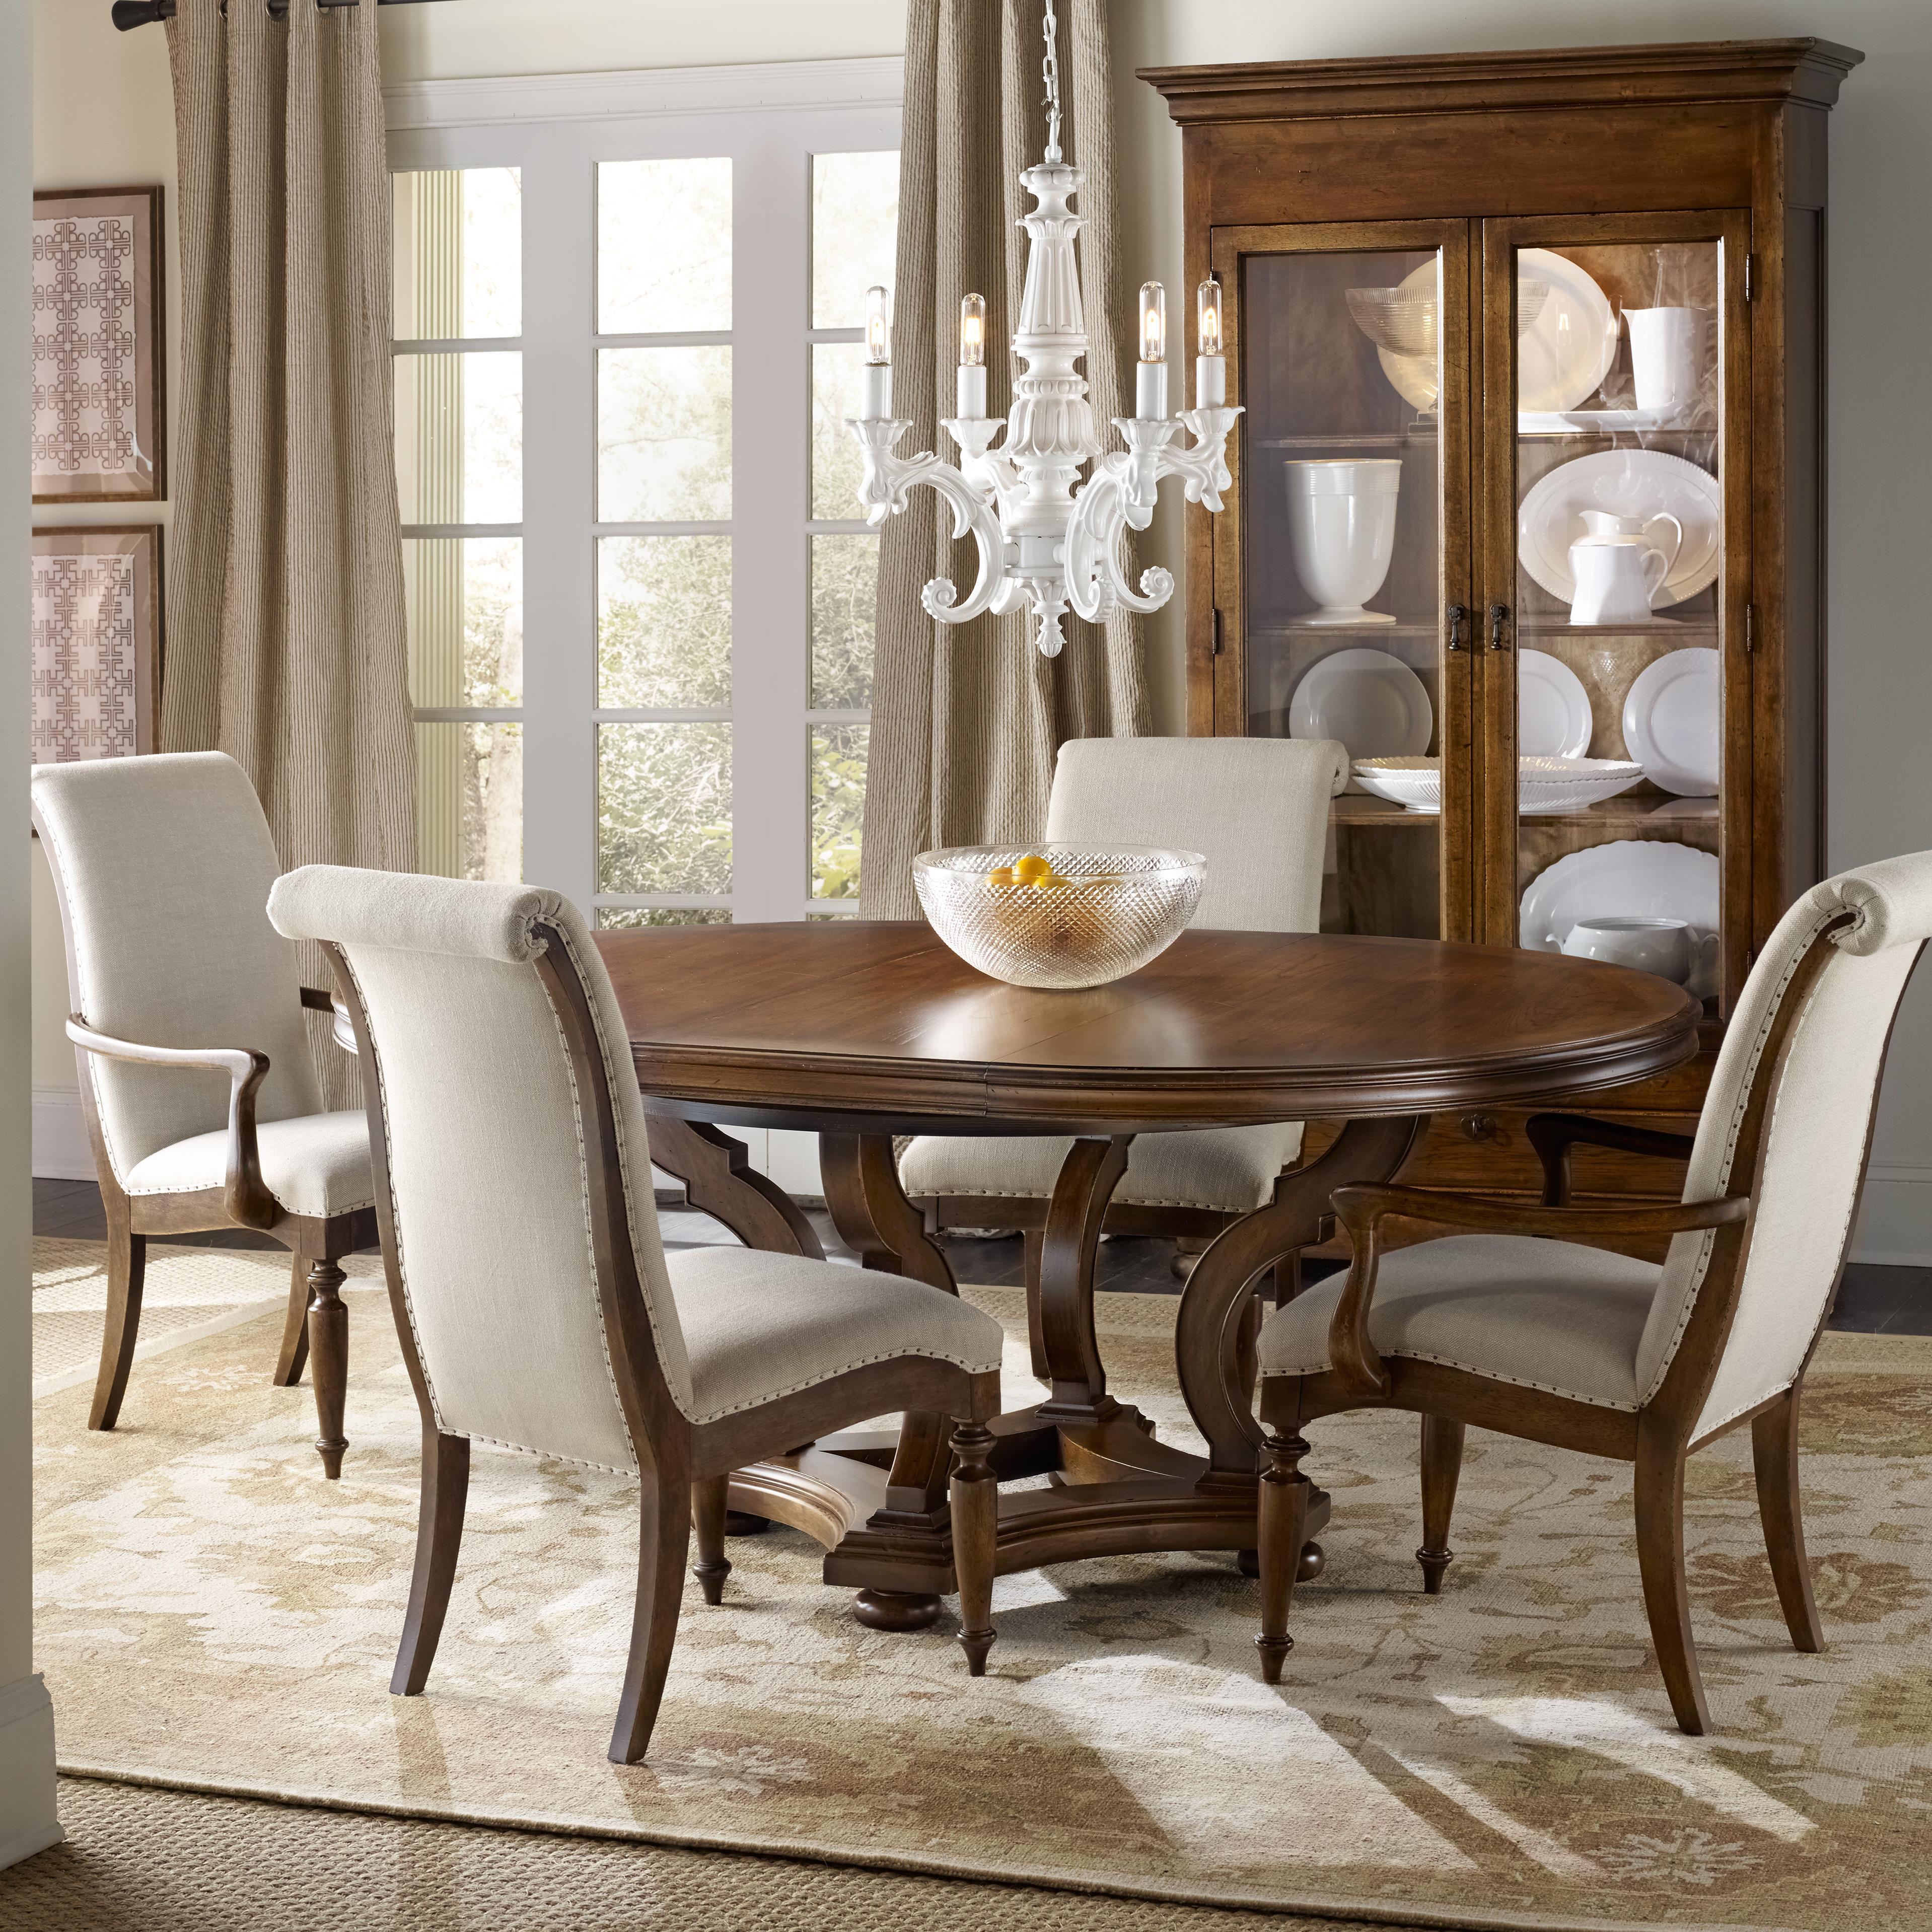 hooker furniture archivist 5 piece dining set with round. Black Bedroom Furniture Sets. Home Design Ideas